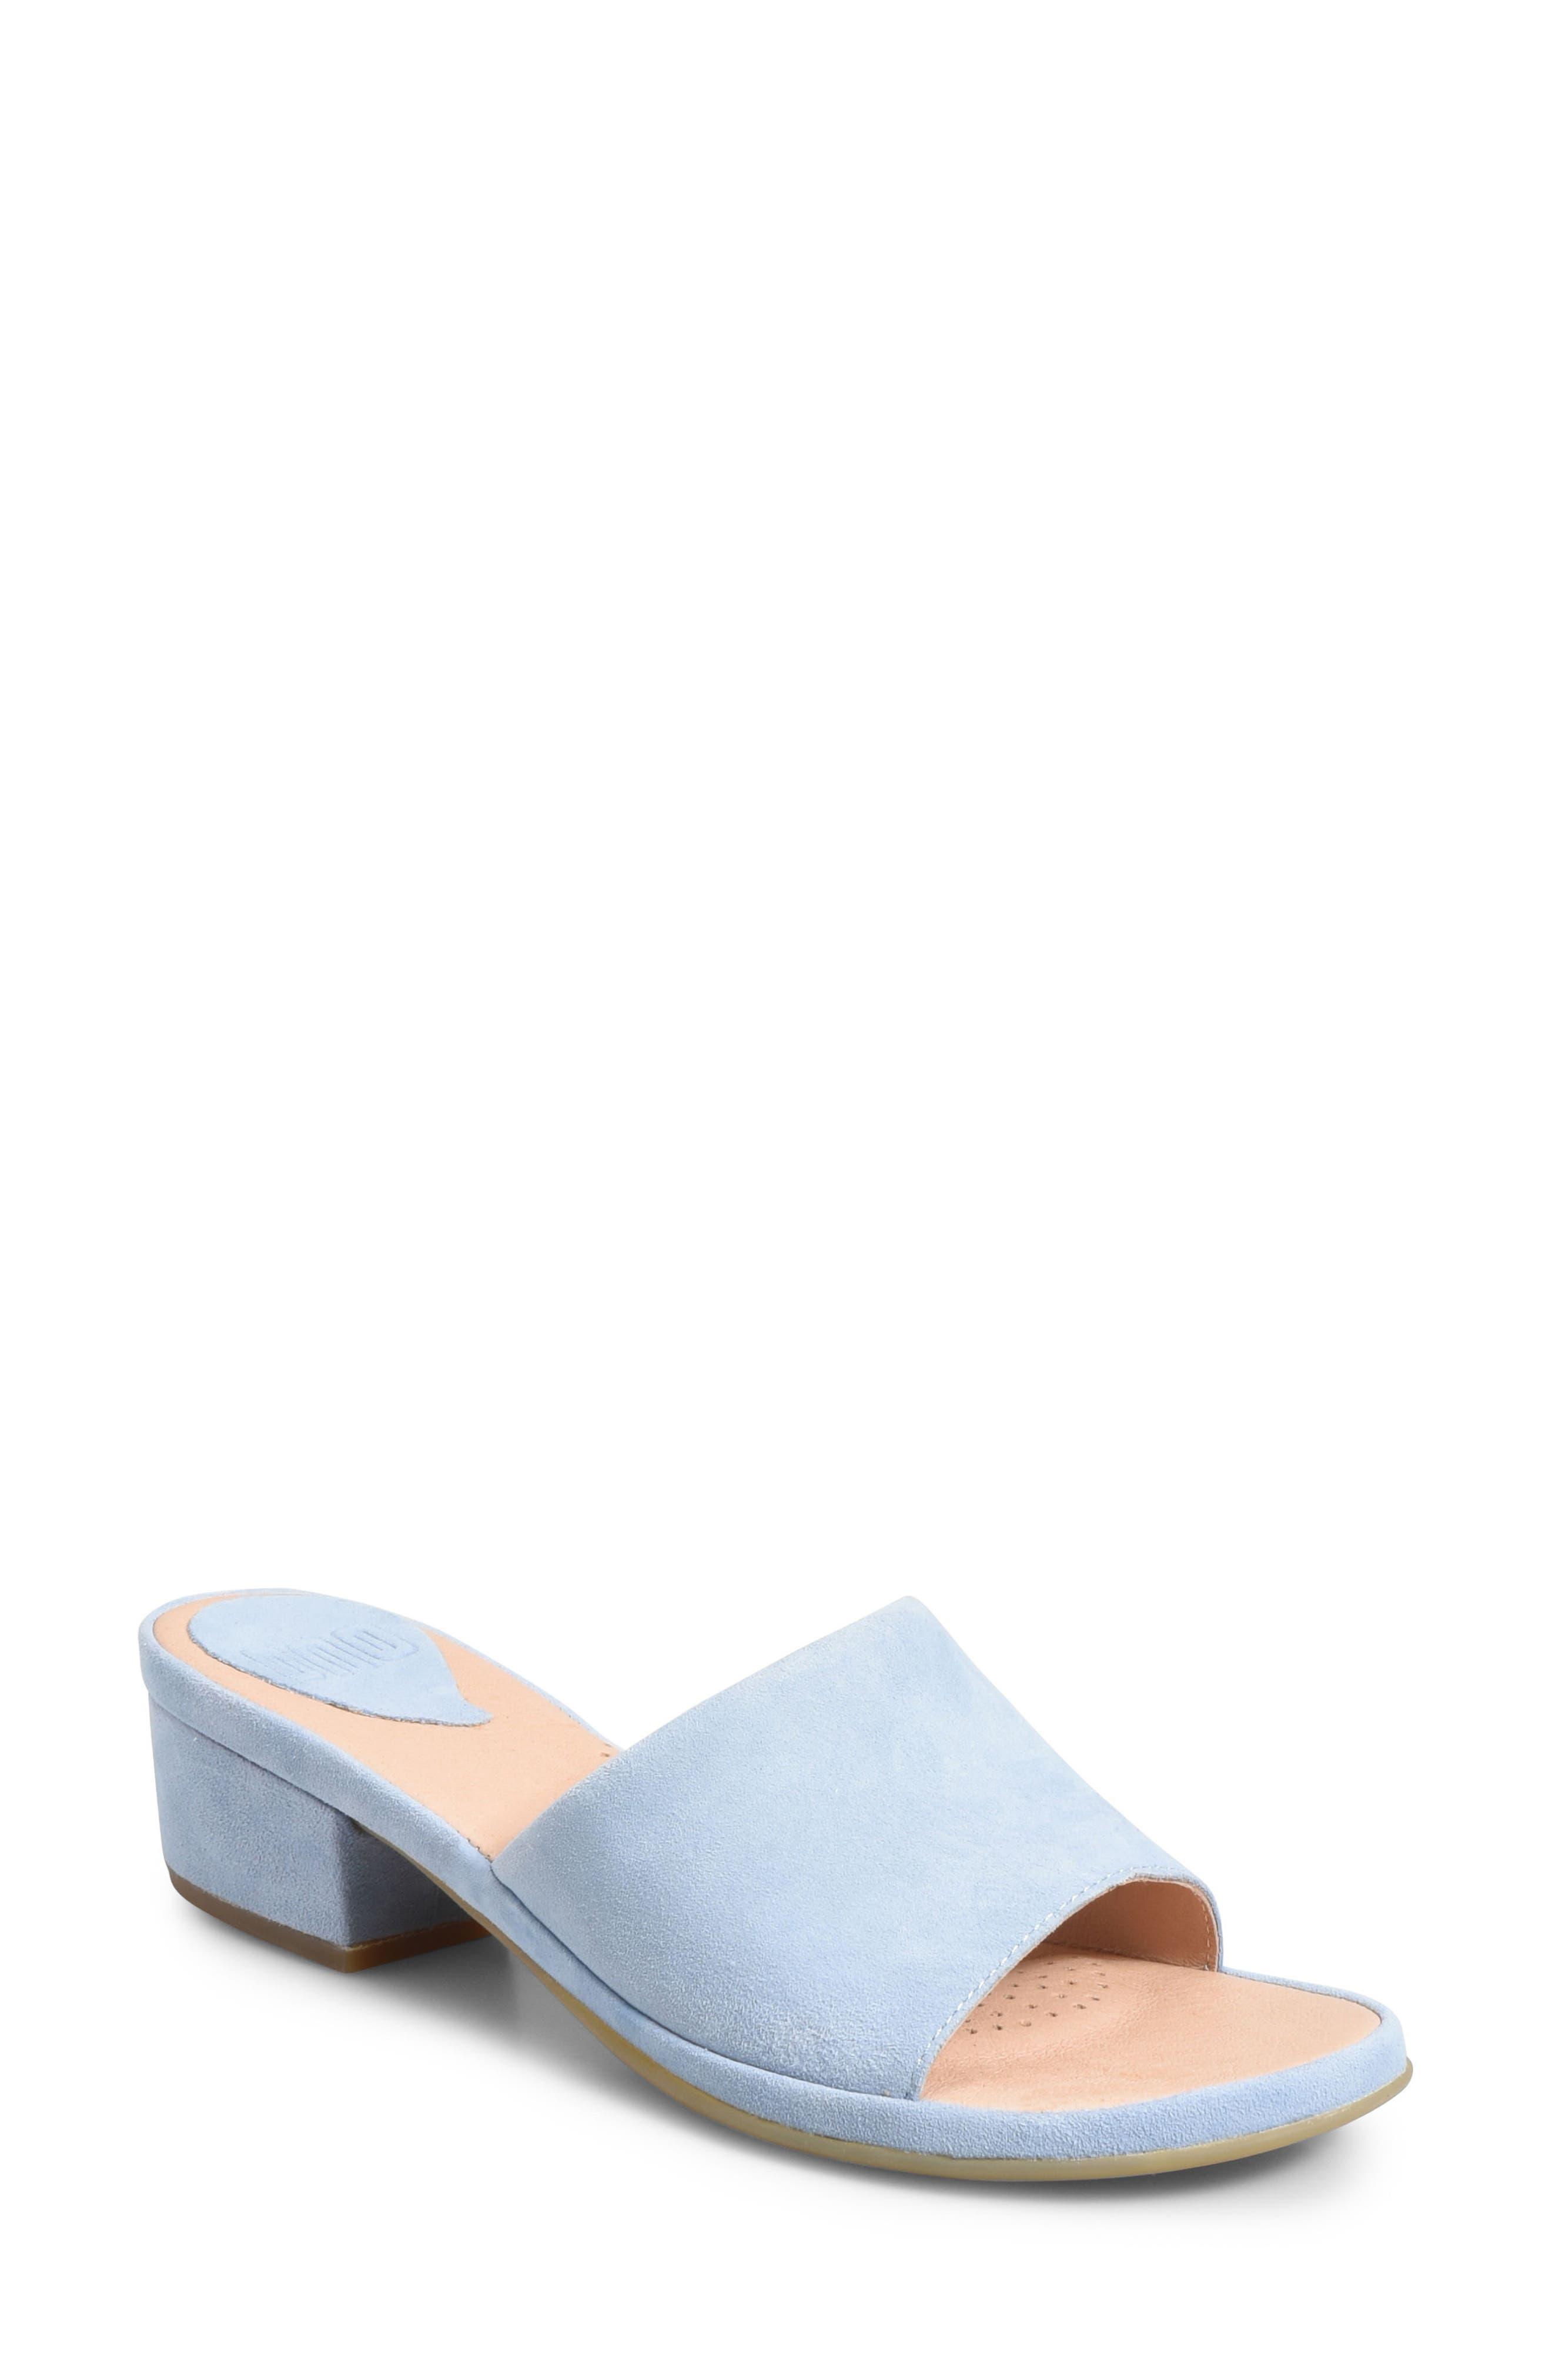 Ono Bo Block Heel Slide Sandal, Blue